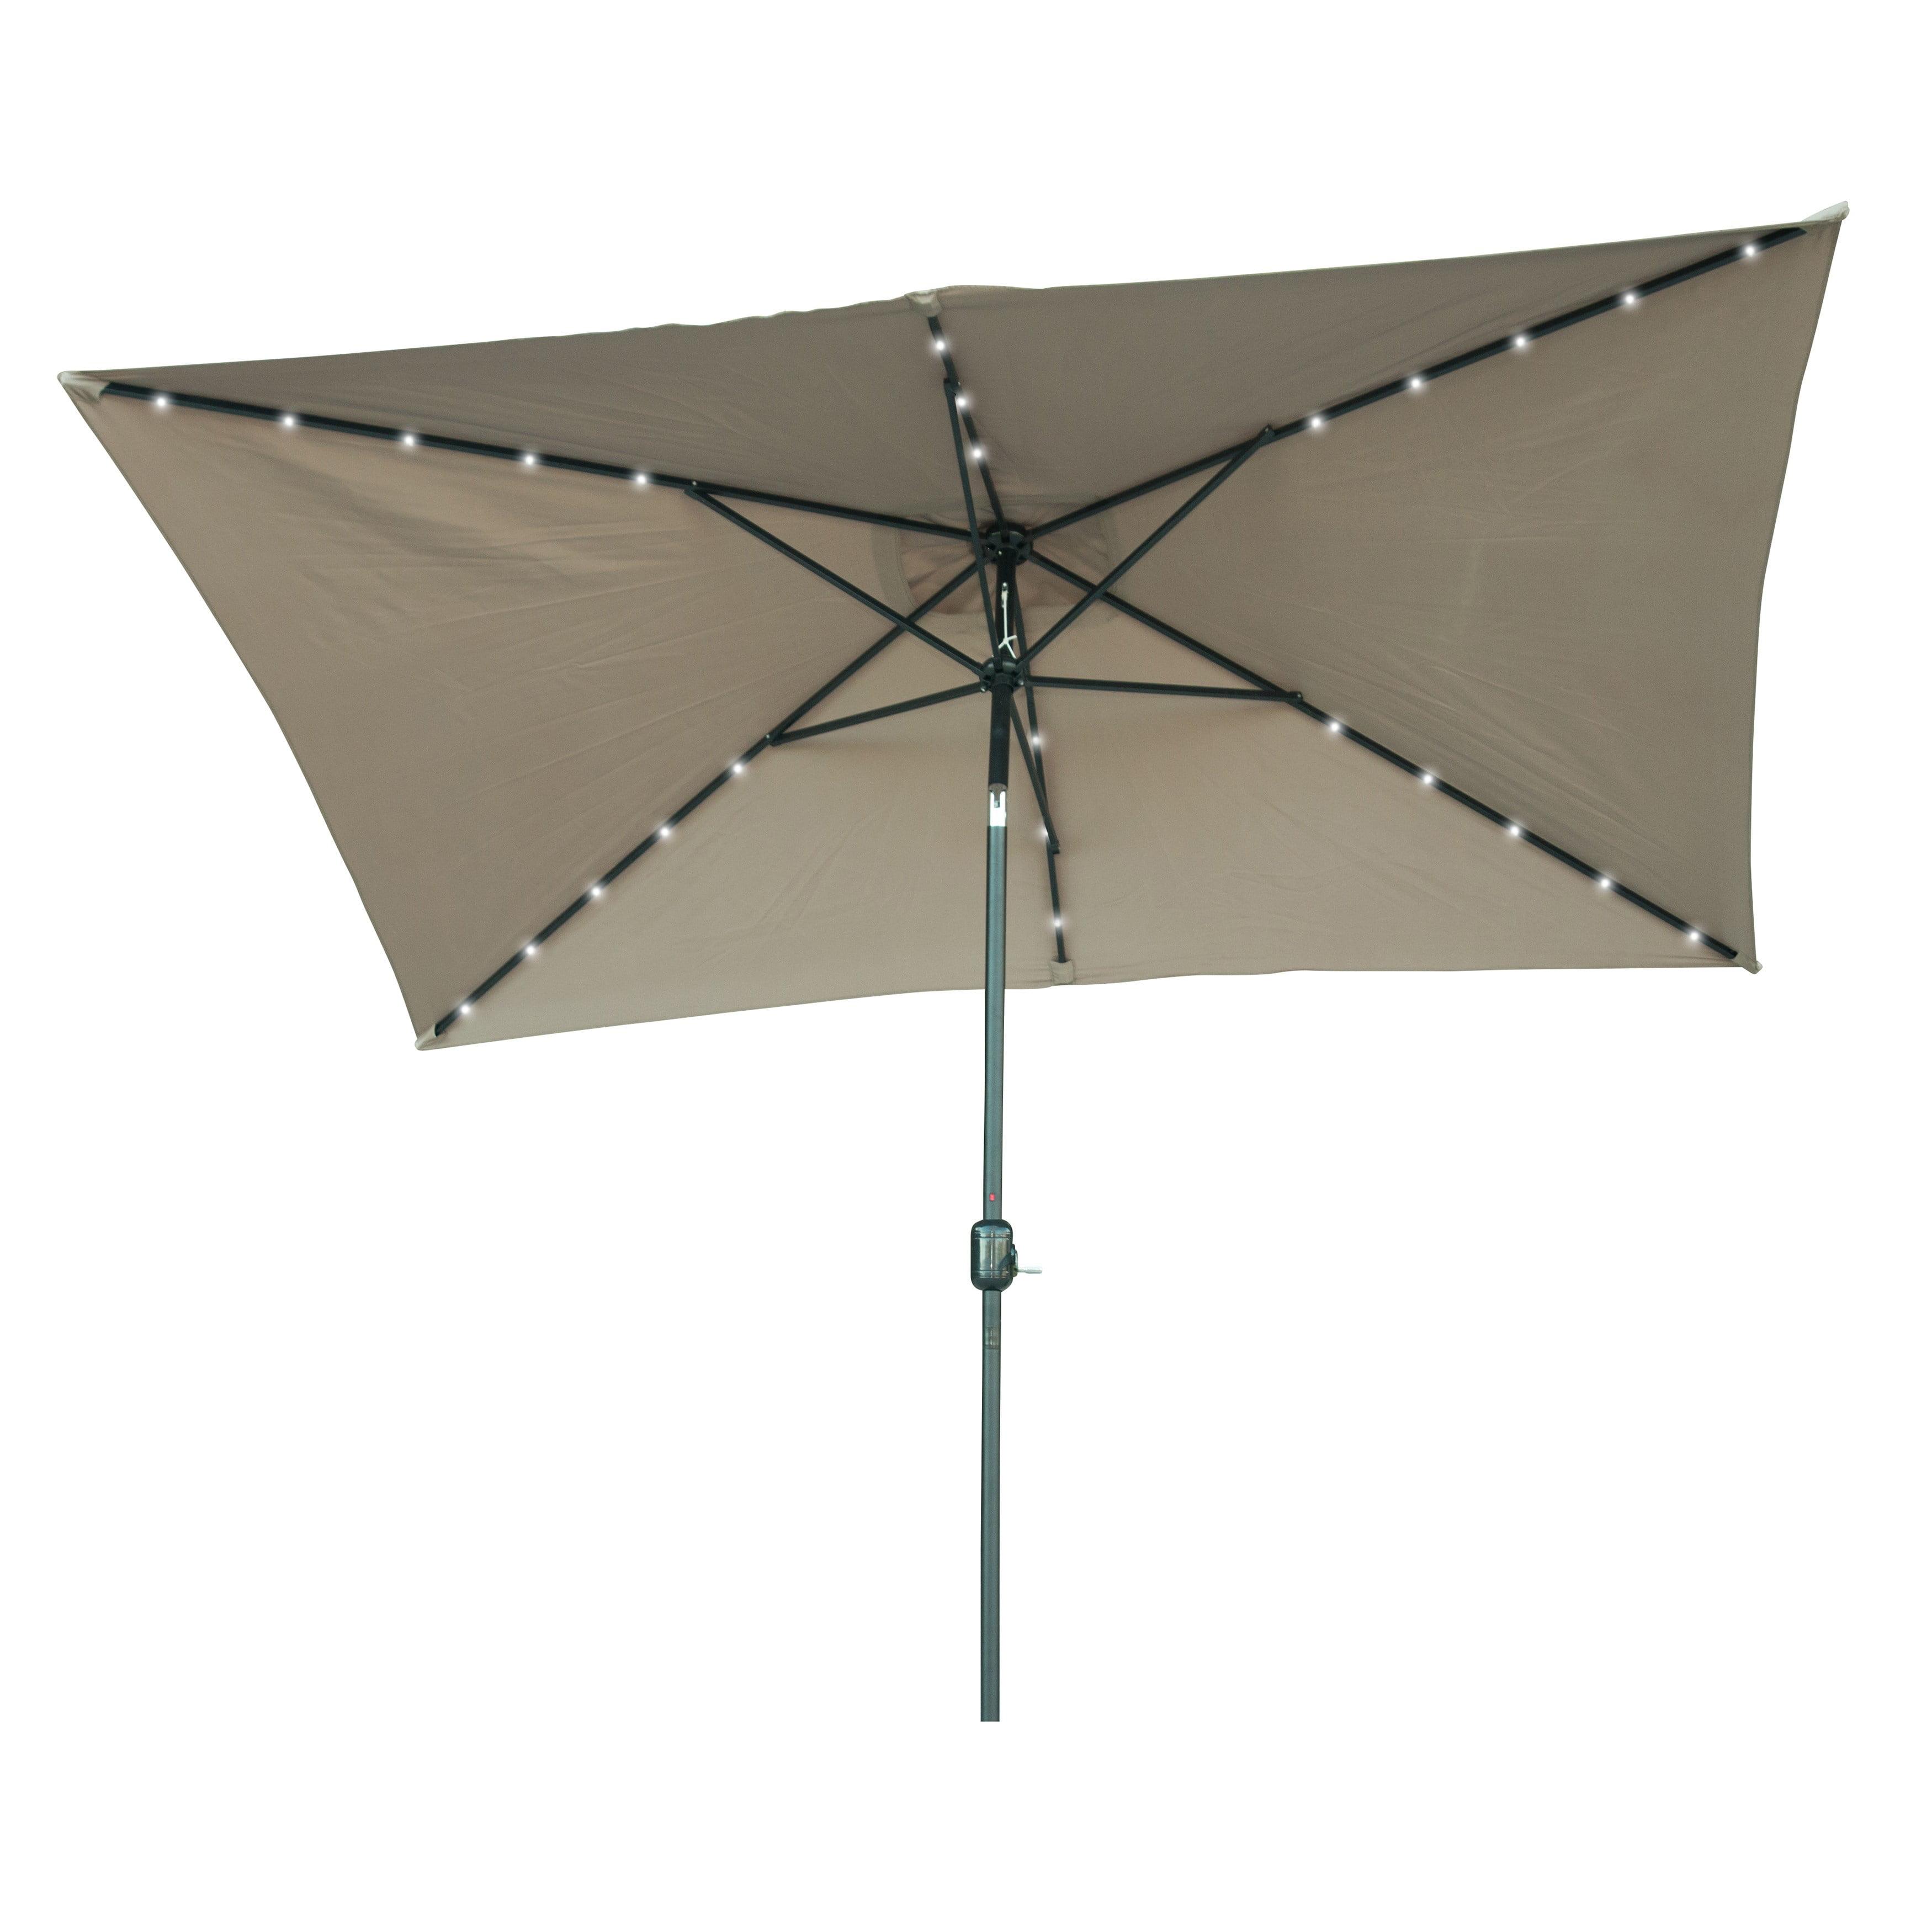 Rectangular Solar Ed Led Lighted Patio Umbrella 10 X 6 5 By Trademark Innovations Tan